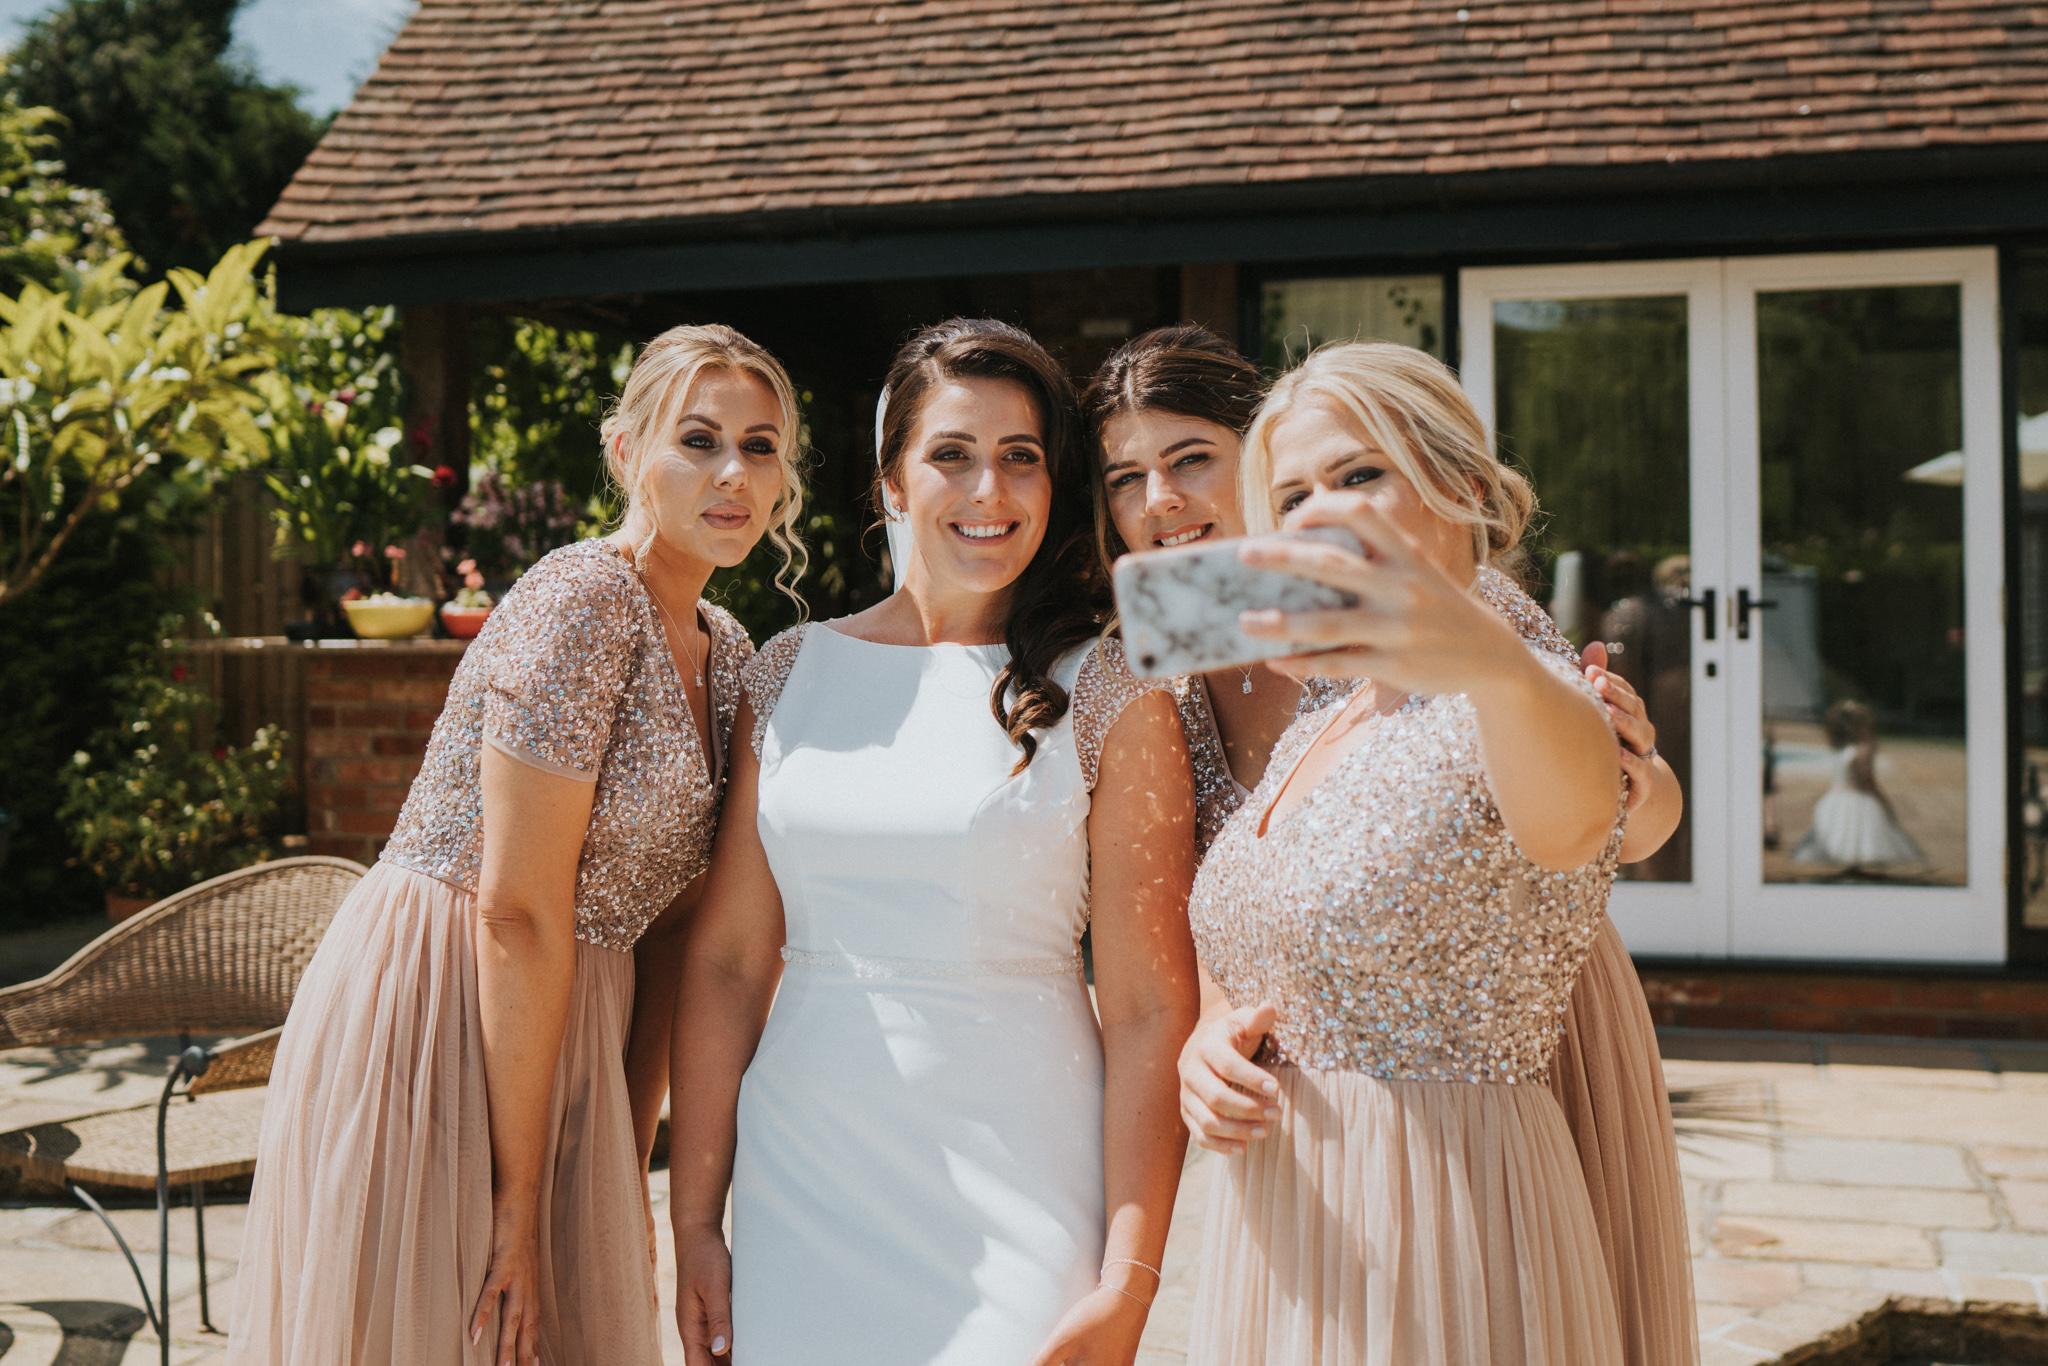 danielle-and-gareths-boho-wedding-previews-at-high-house-weddings-grace-elizabeth-colchester-essex-suffolk-norfolk-devon-alternative-wedding-and-lifestyle-photographer (19 of 76).jpg